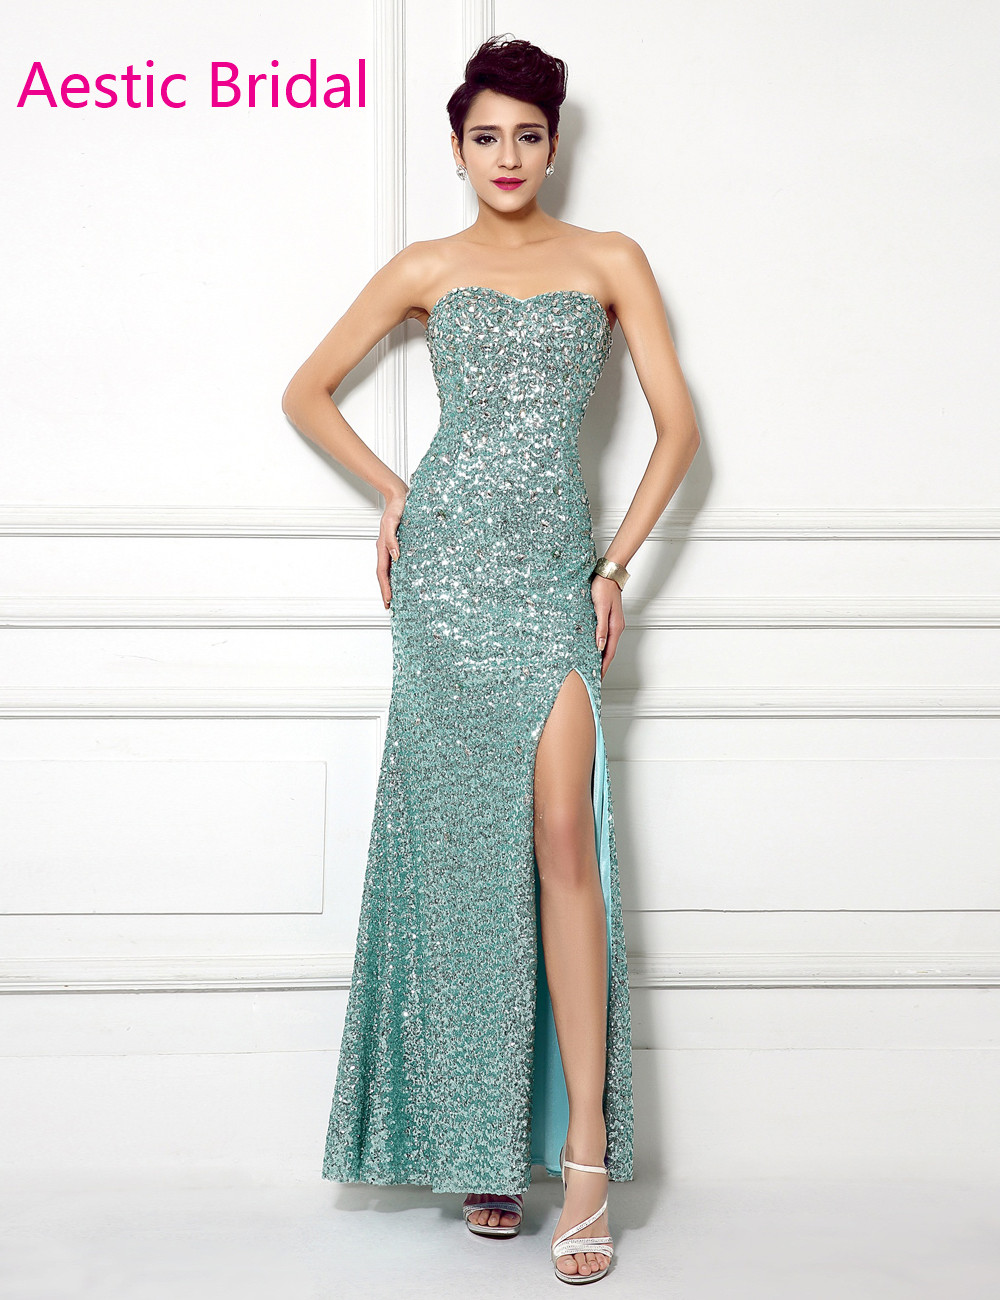 Dorable Vestido Sin Tirantes Del Baile Novia Ideas Ornamento ...